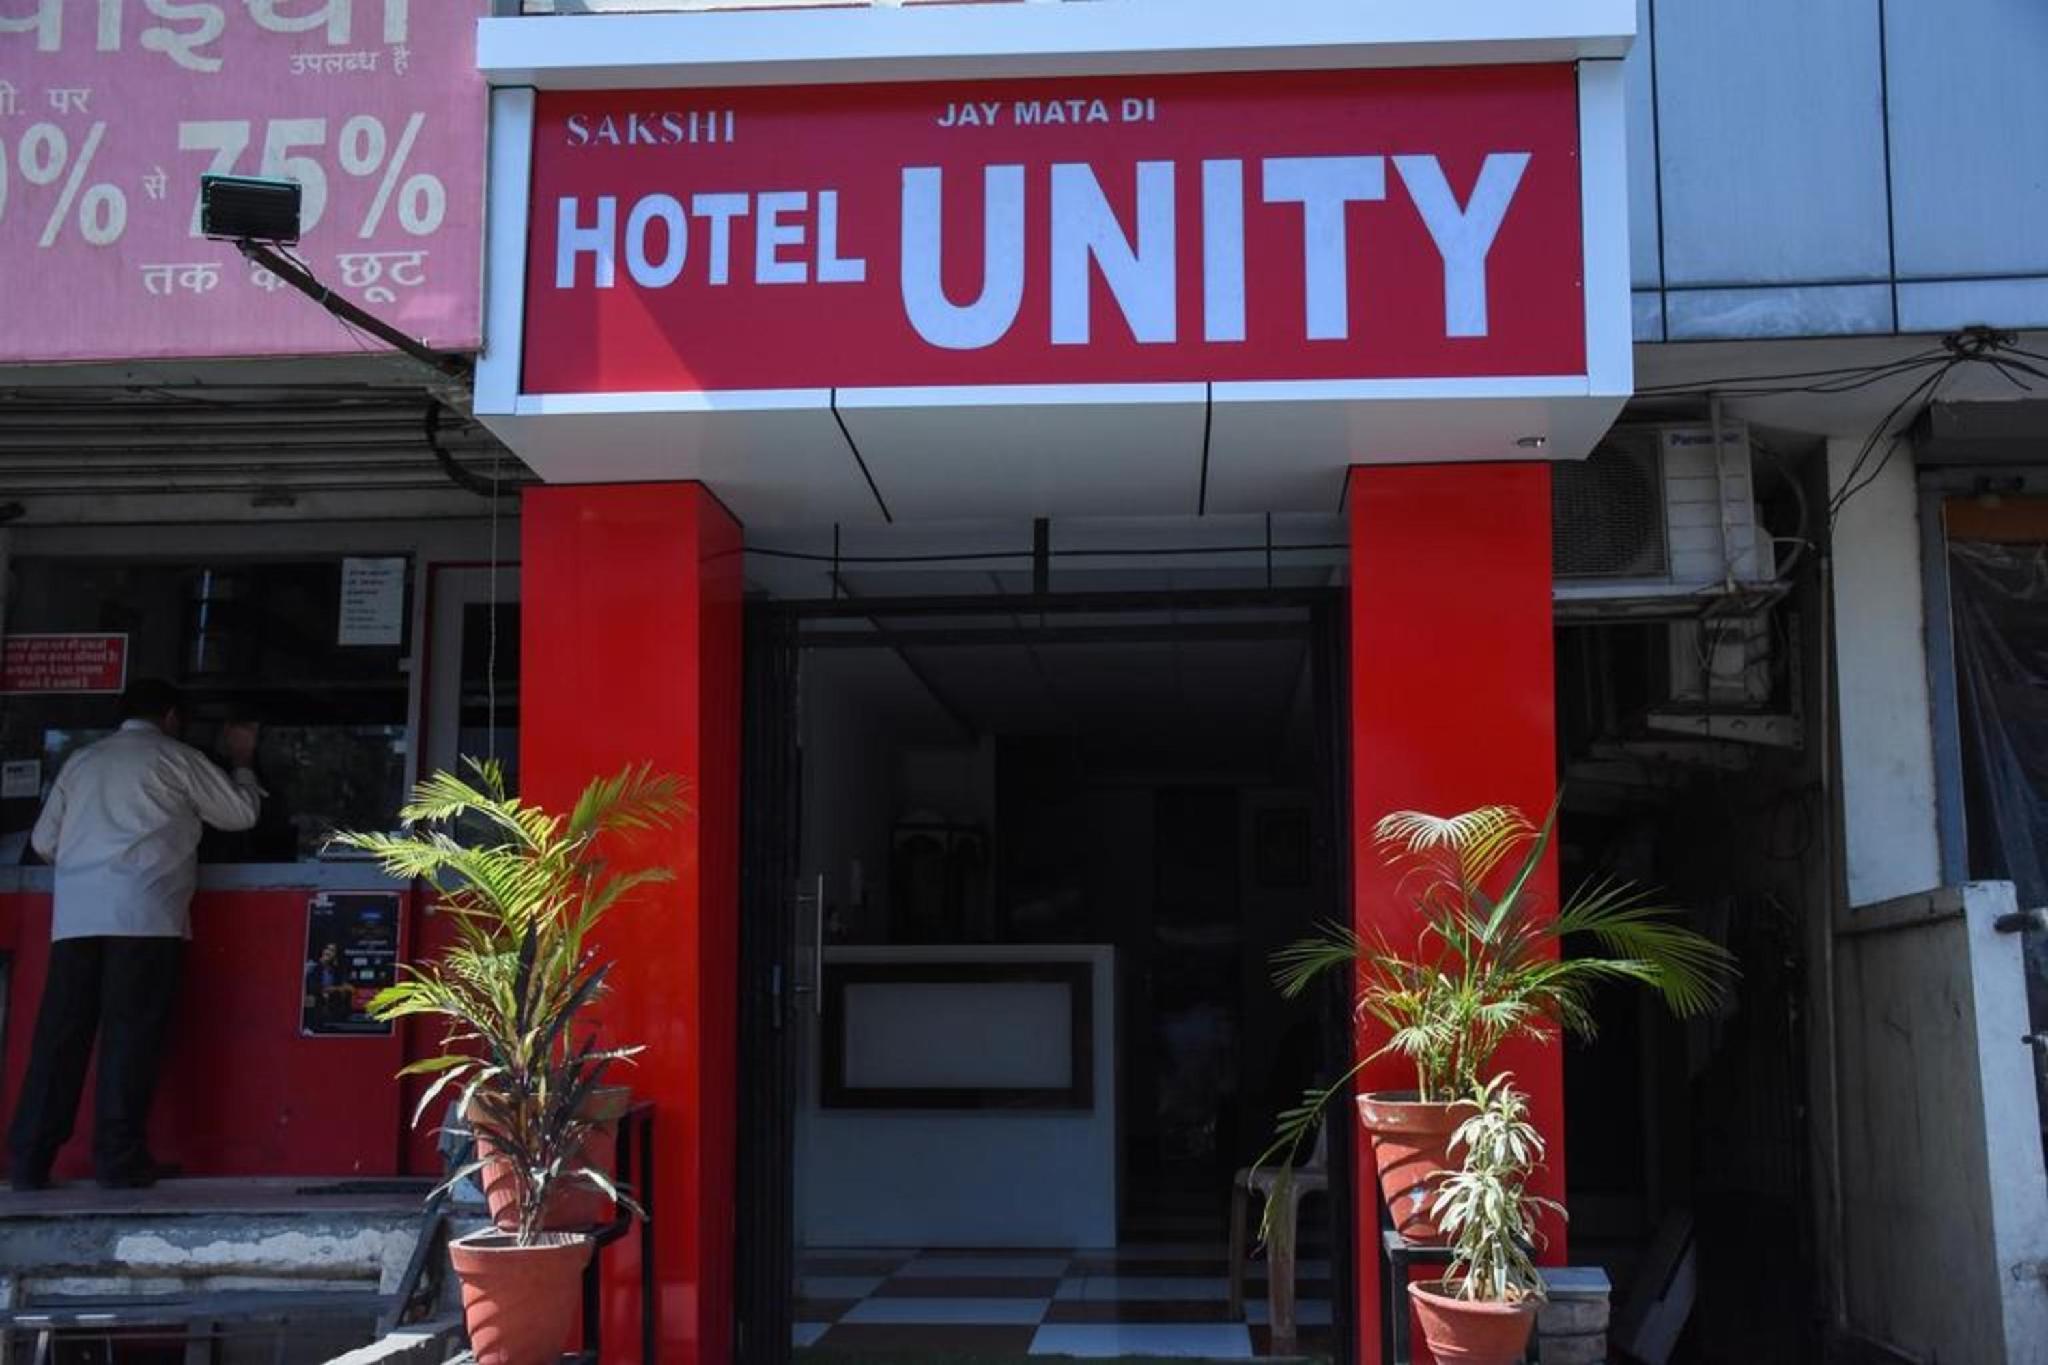 Hotel Unity